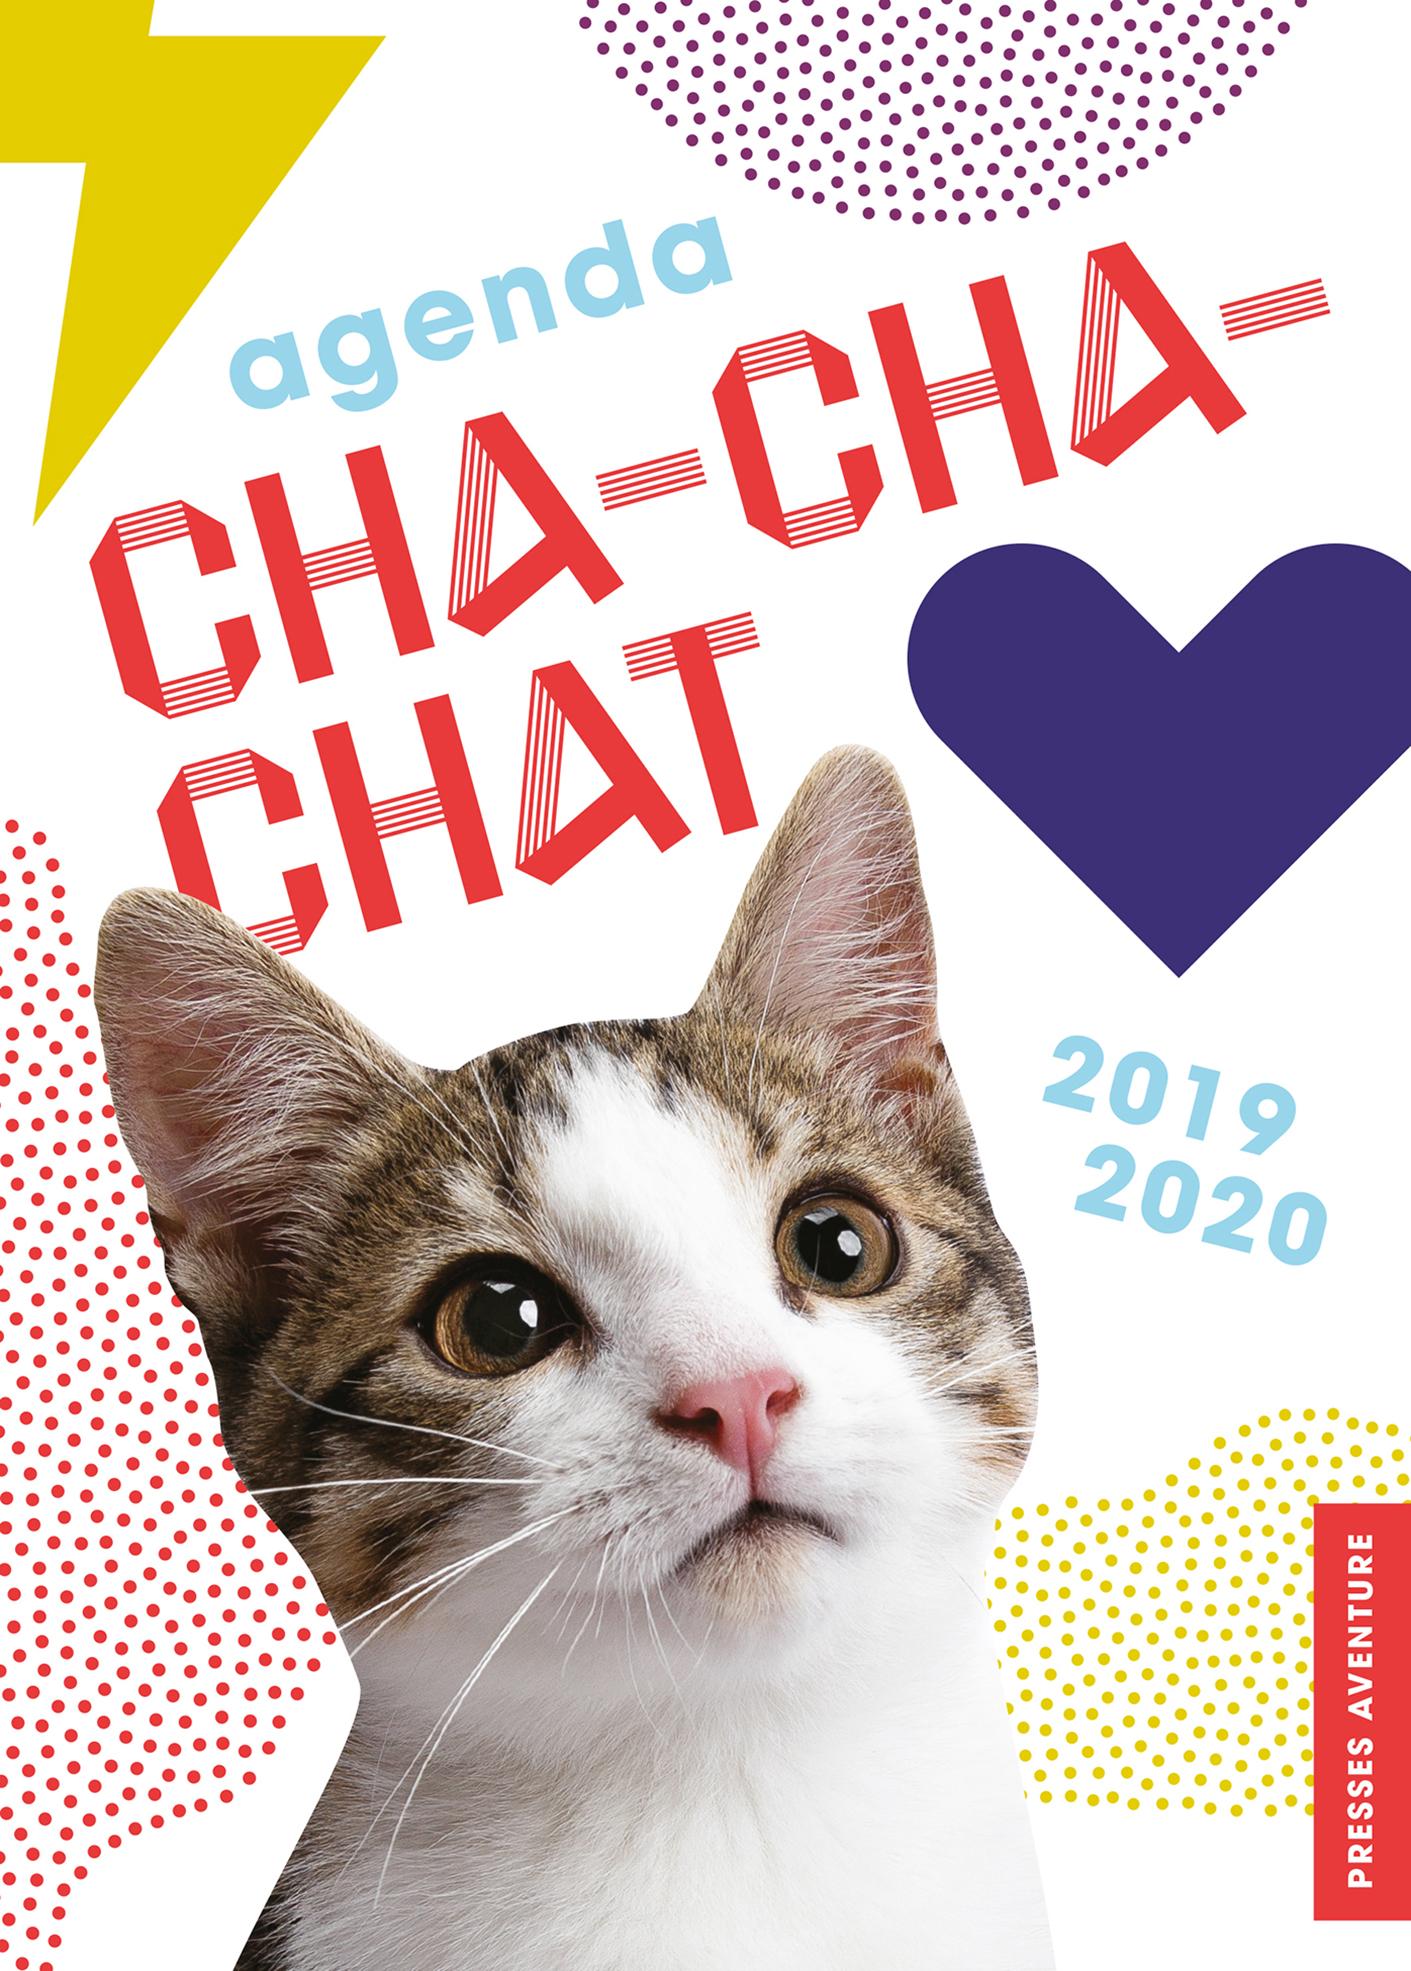 639_AgendaChachachat_C1